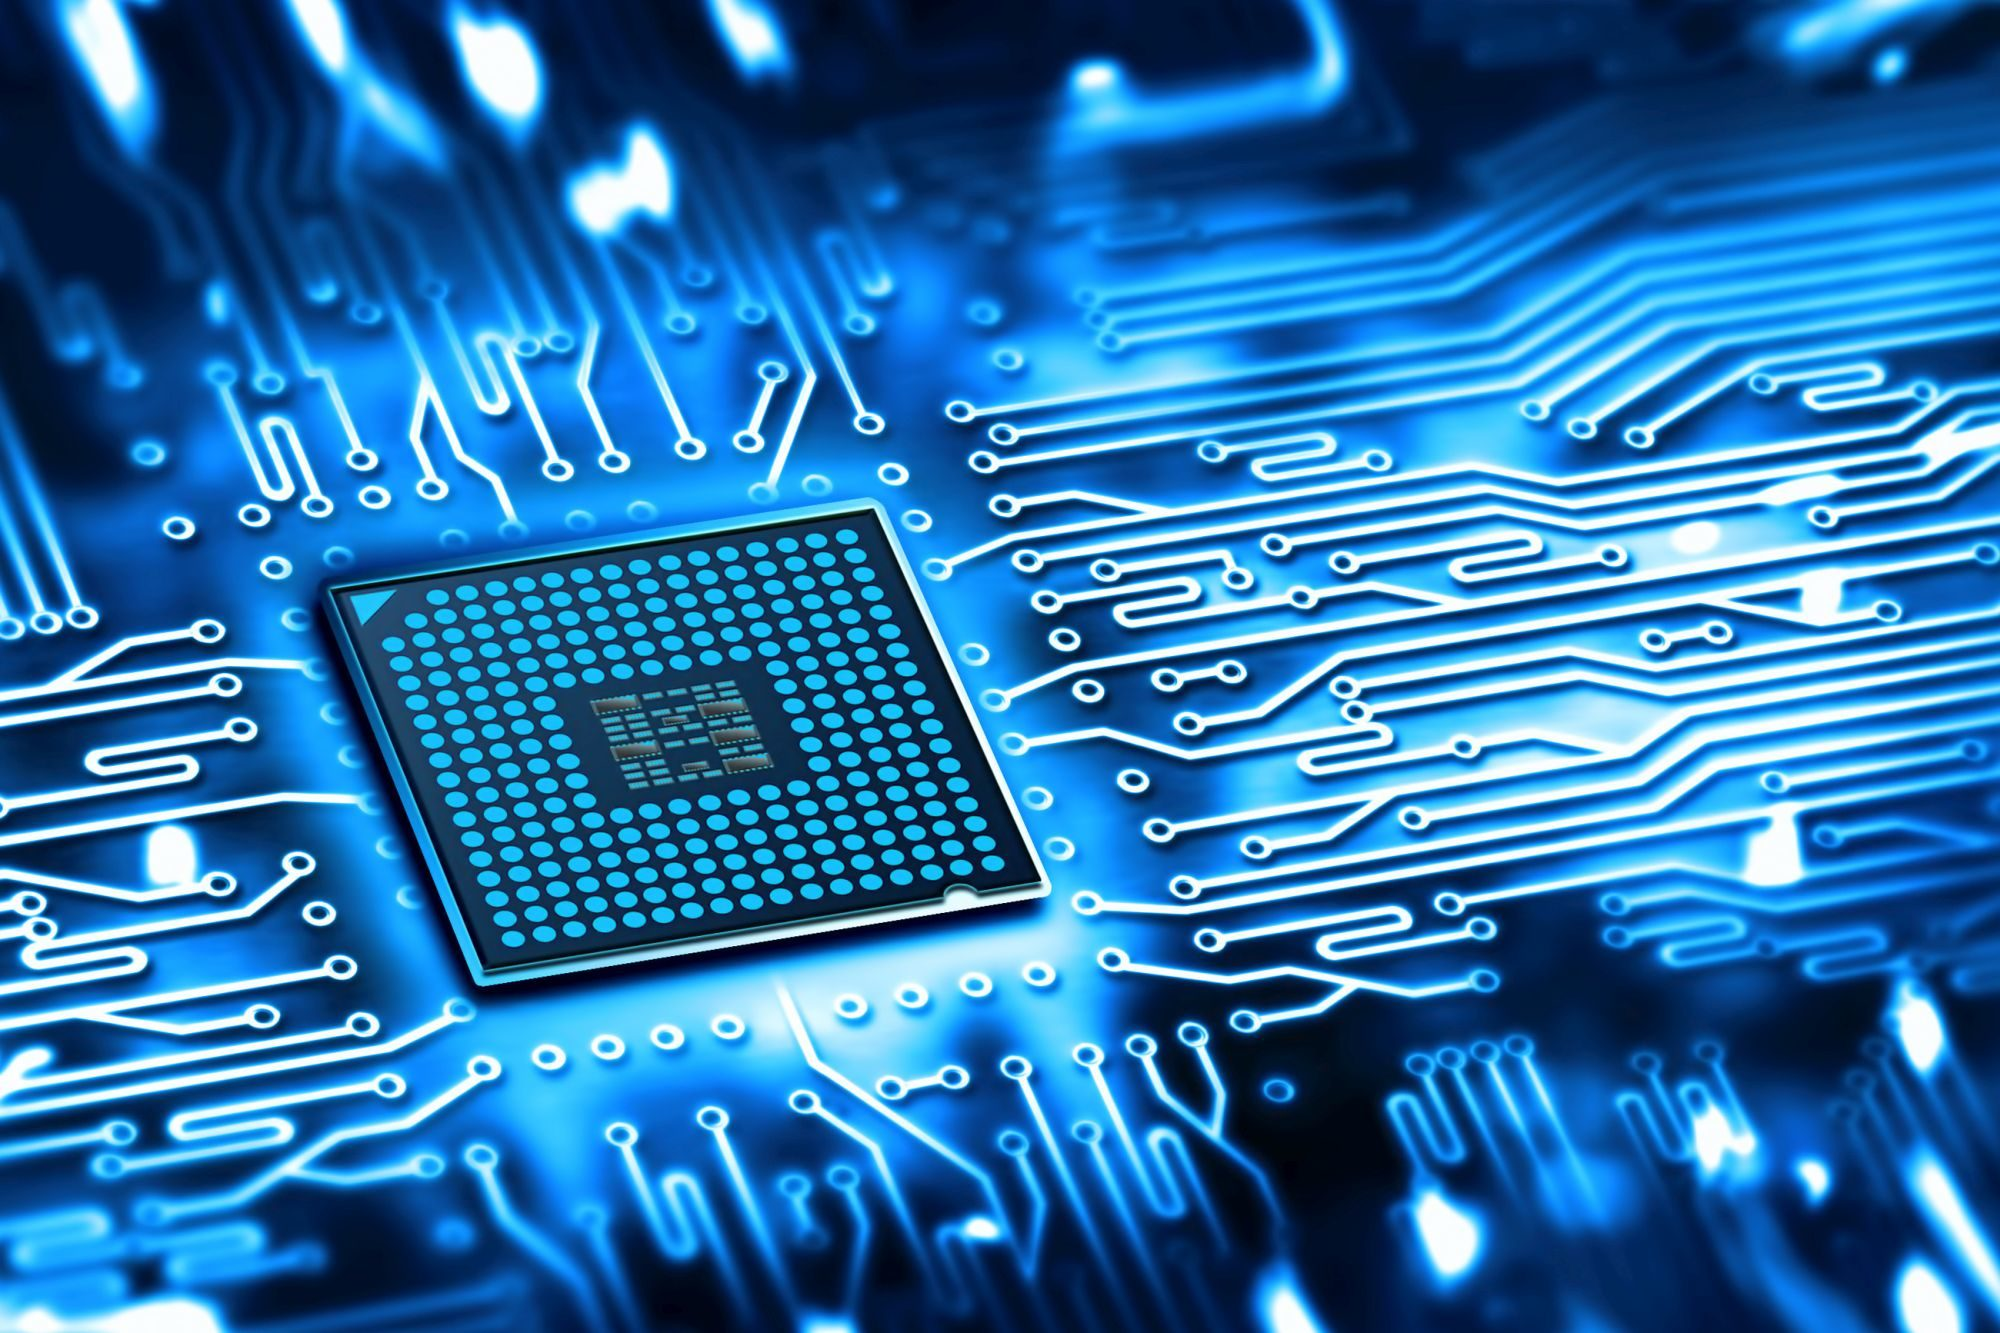 Circuit Boards Metal Finishing Industry